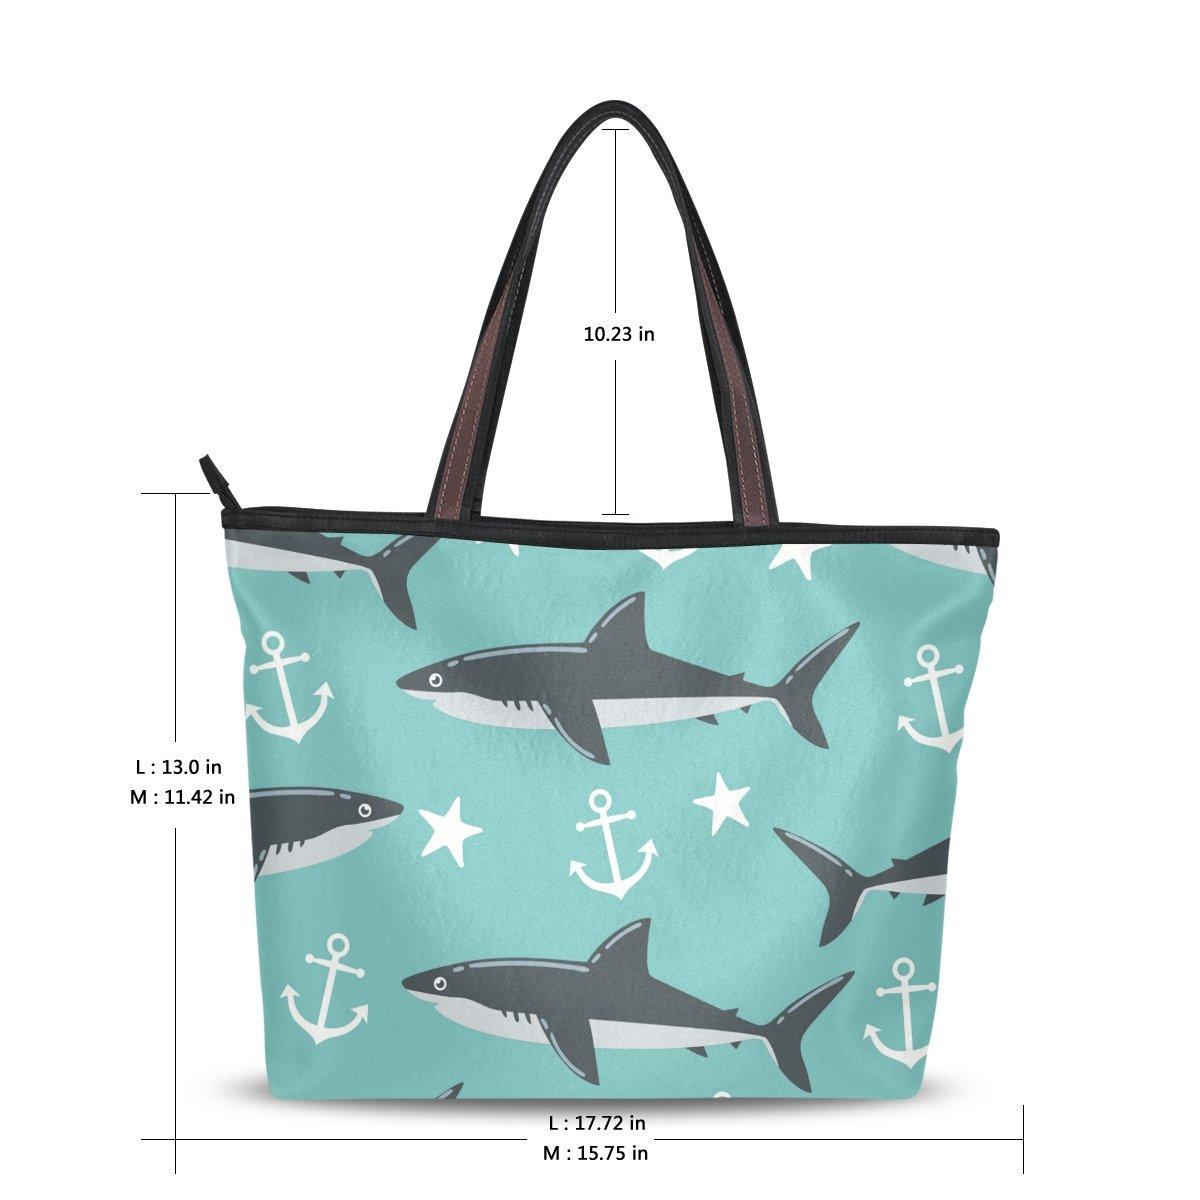 b14aa0856c Amazon.com  Large Beach Travel Tote Bag Shark Anchor Star Printed handbags  with Handle Top Zipper Closure  Clothing